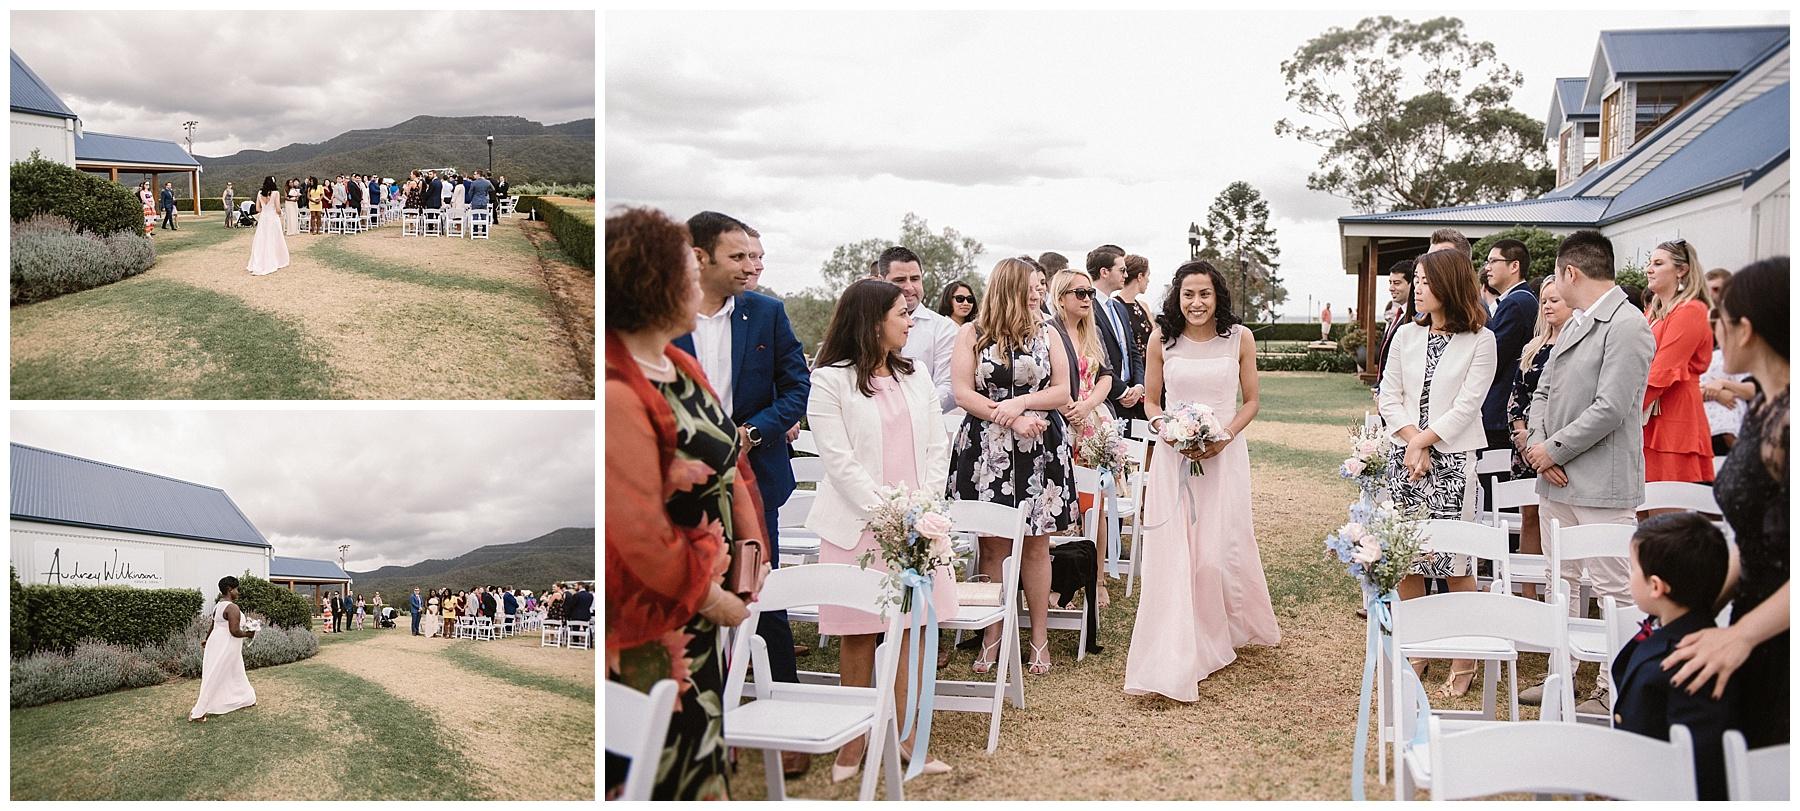 AUDREY WILKING COCKFIGHTERS GHOST Wedding Photographer_0028.jpg